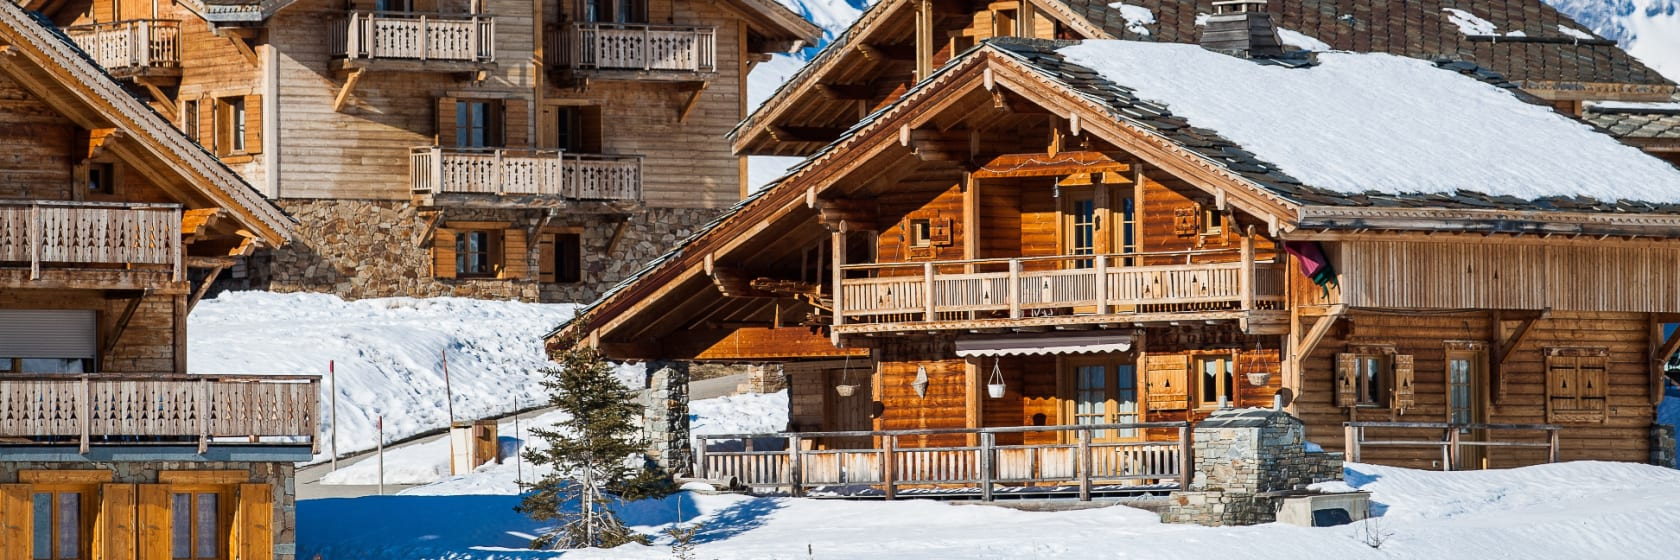 Træfarvet ski chalet i seen med blå himmel i Alpe d Huez